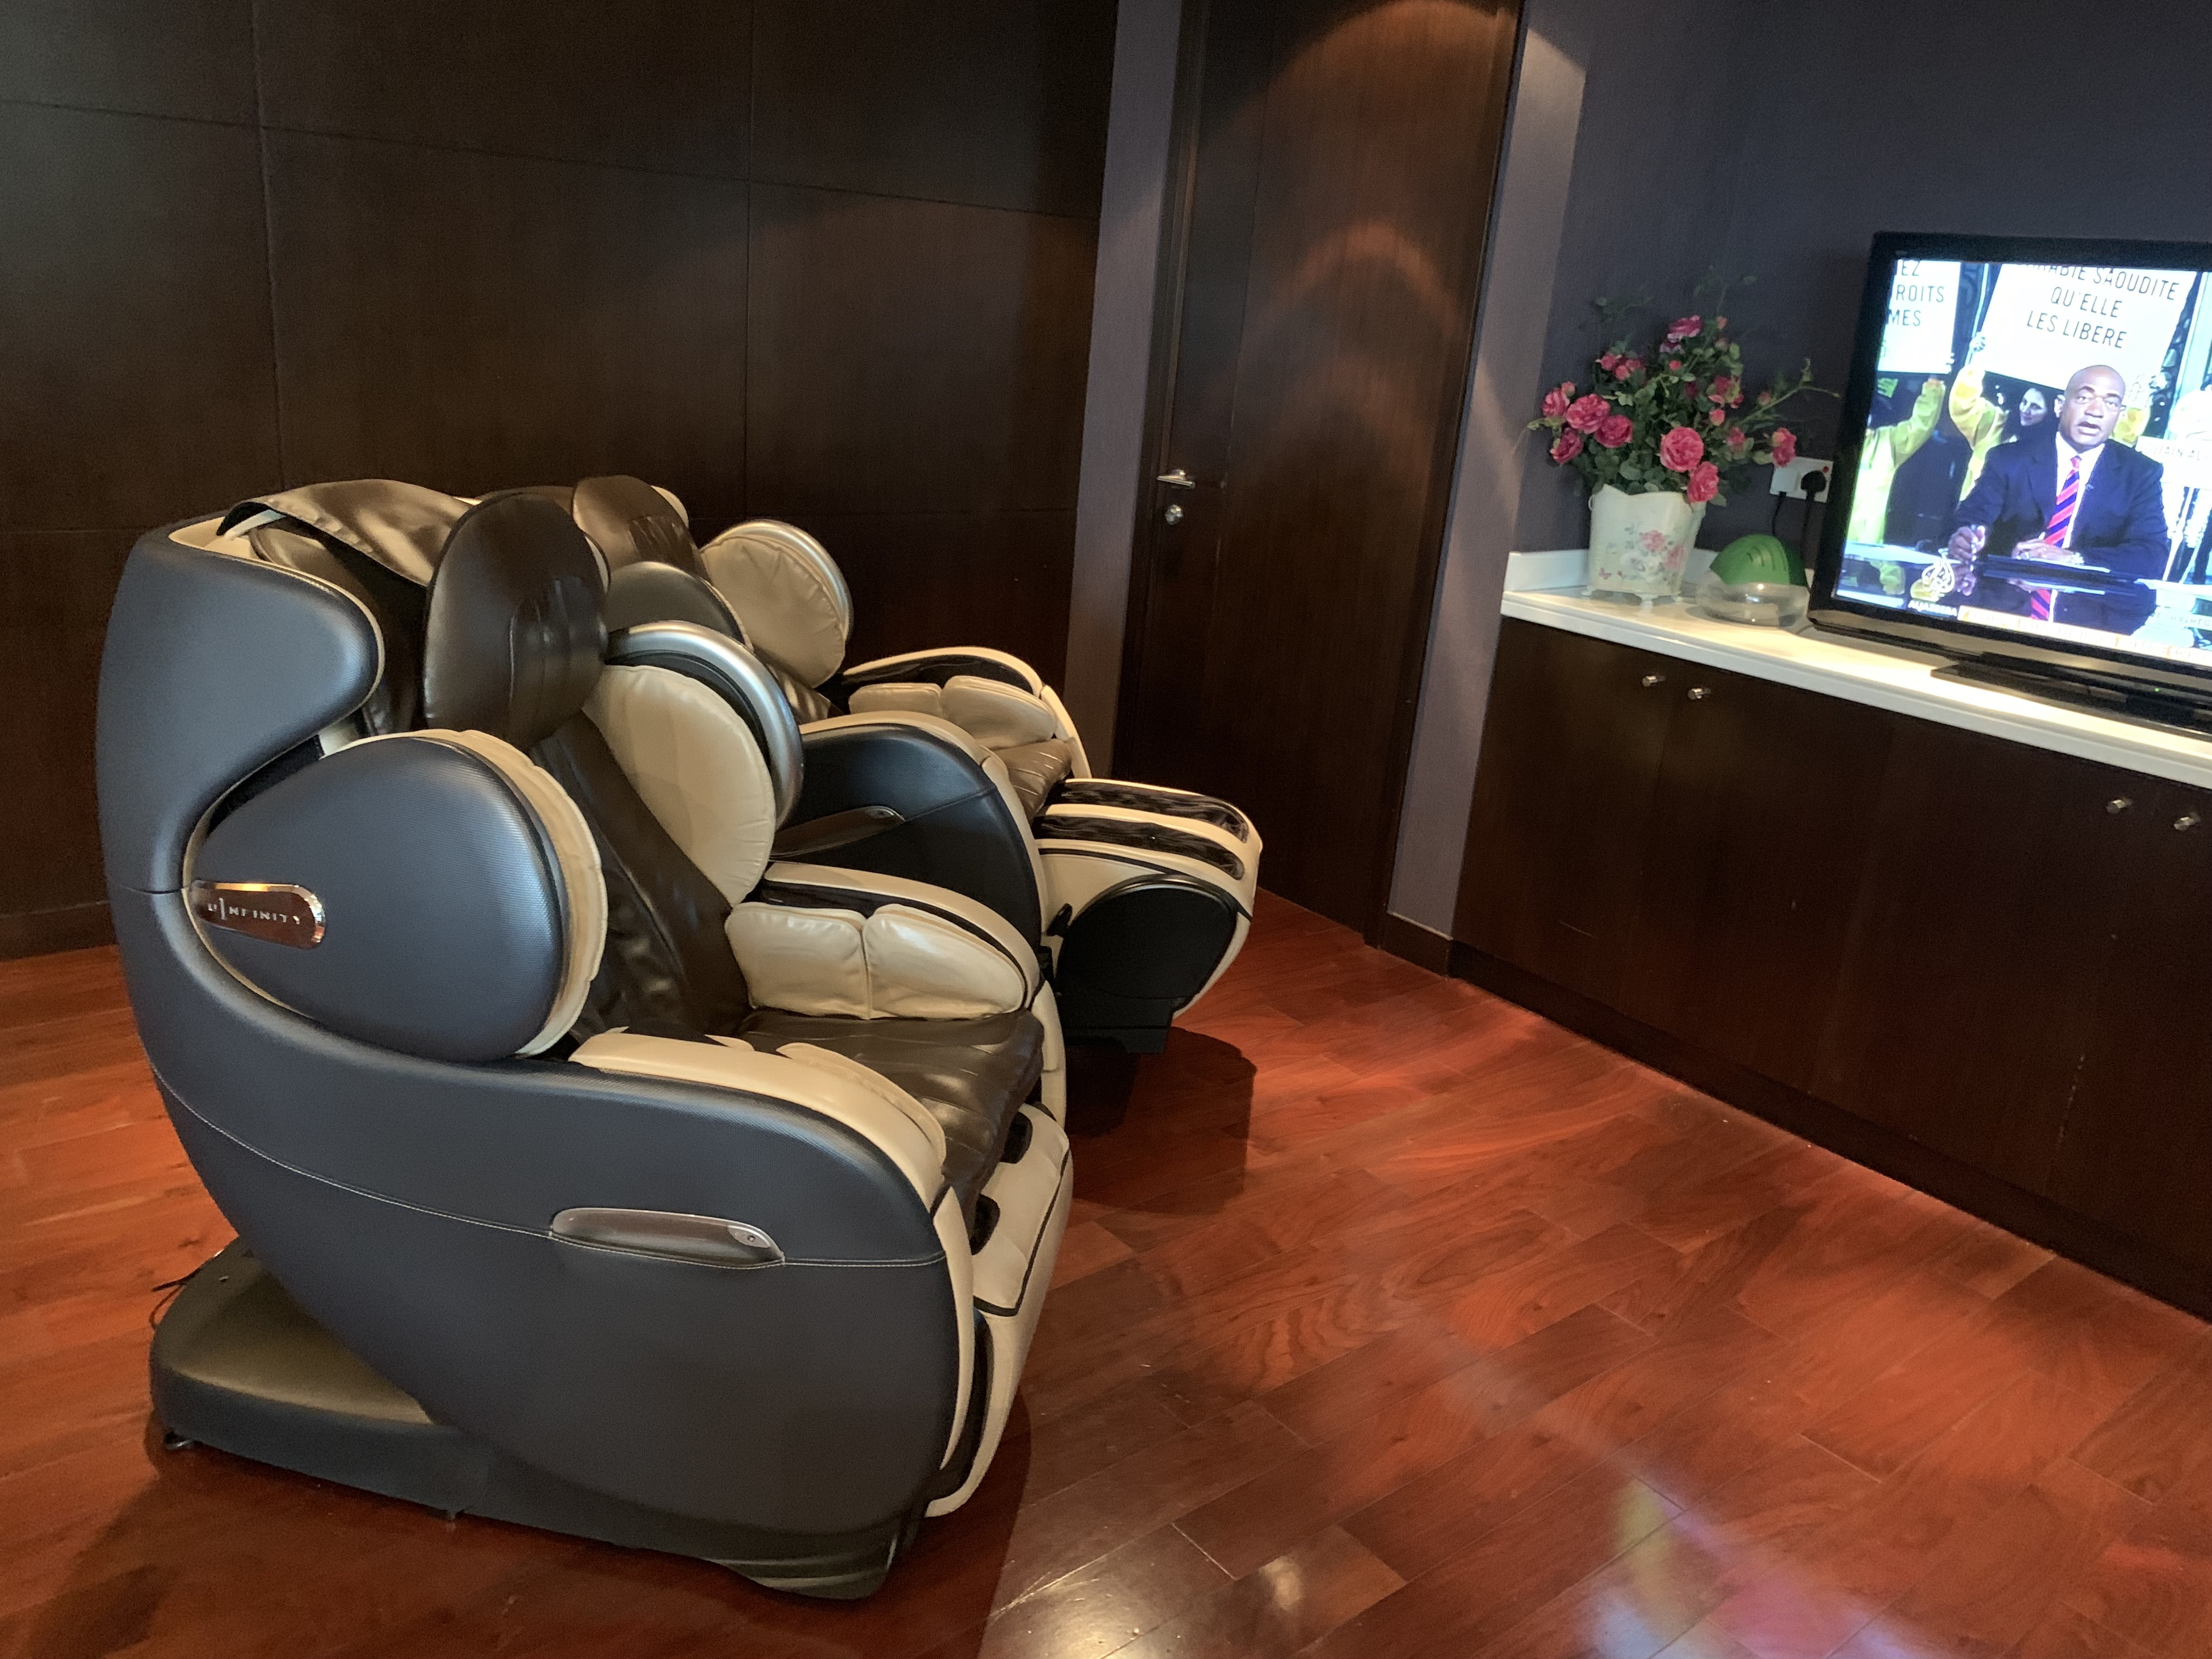 Thai Airways Royal Orchid Lounge